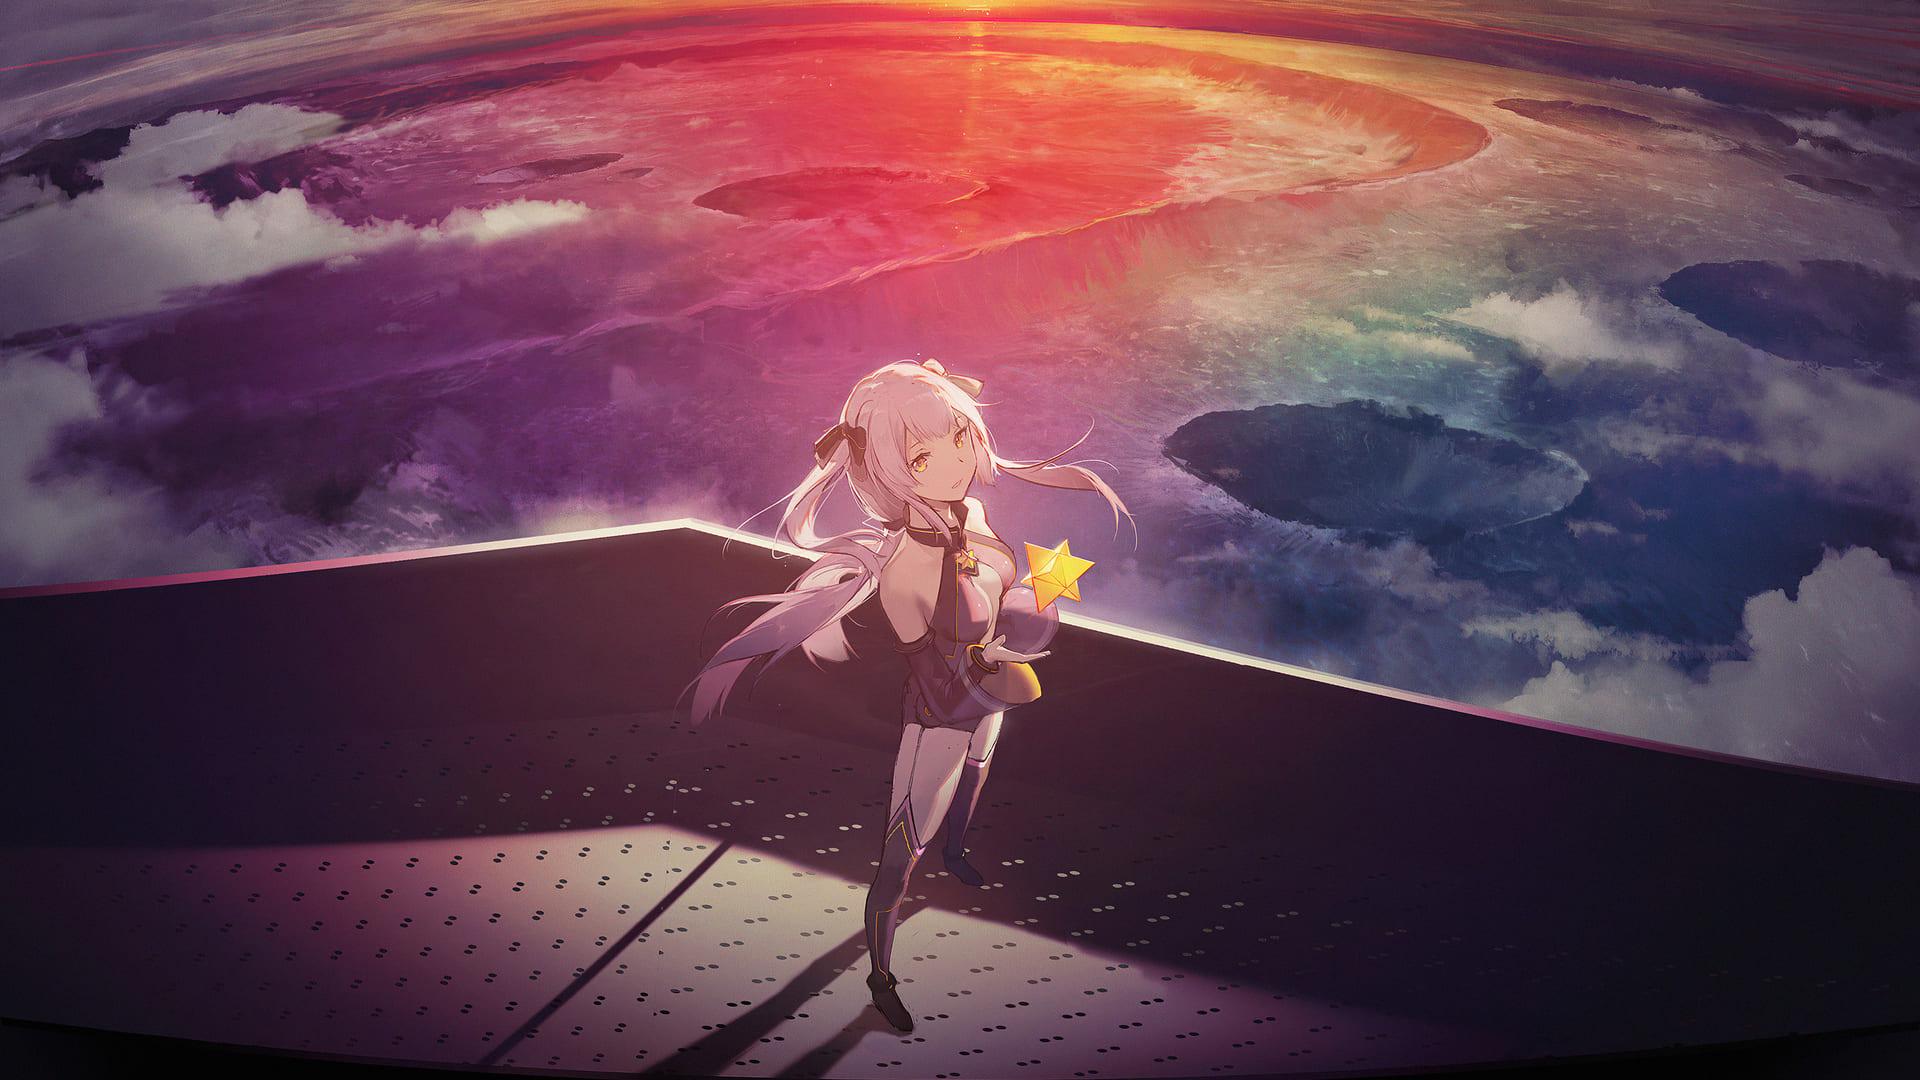 Aesthetic Anime Laptop Wallpaper - Top ...